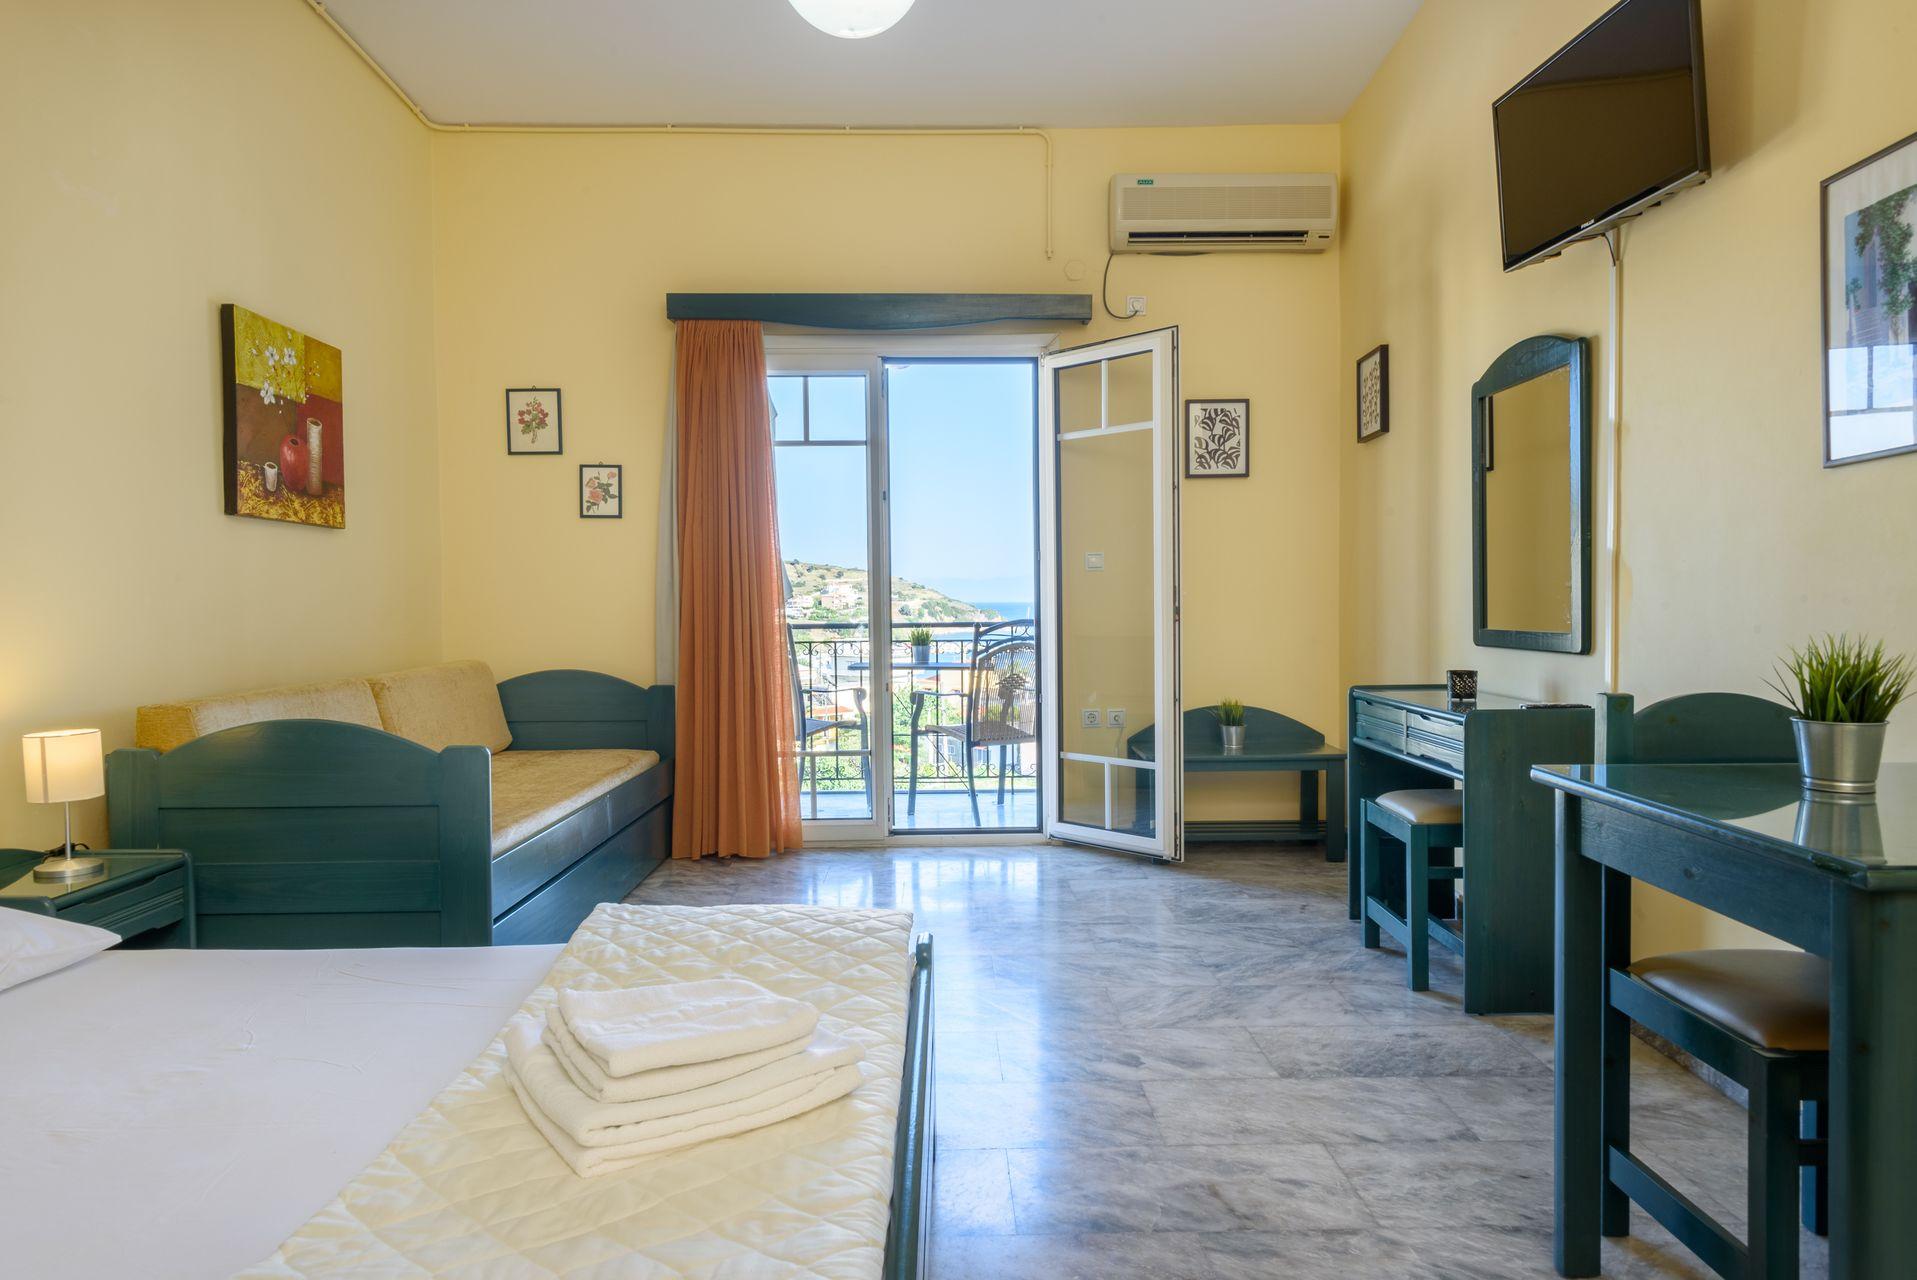 _remvi apartments-0045_resized